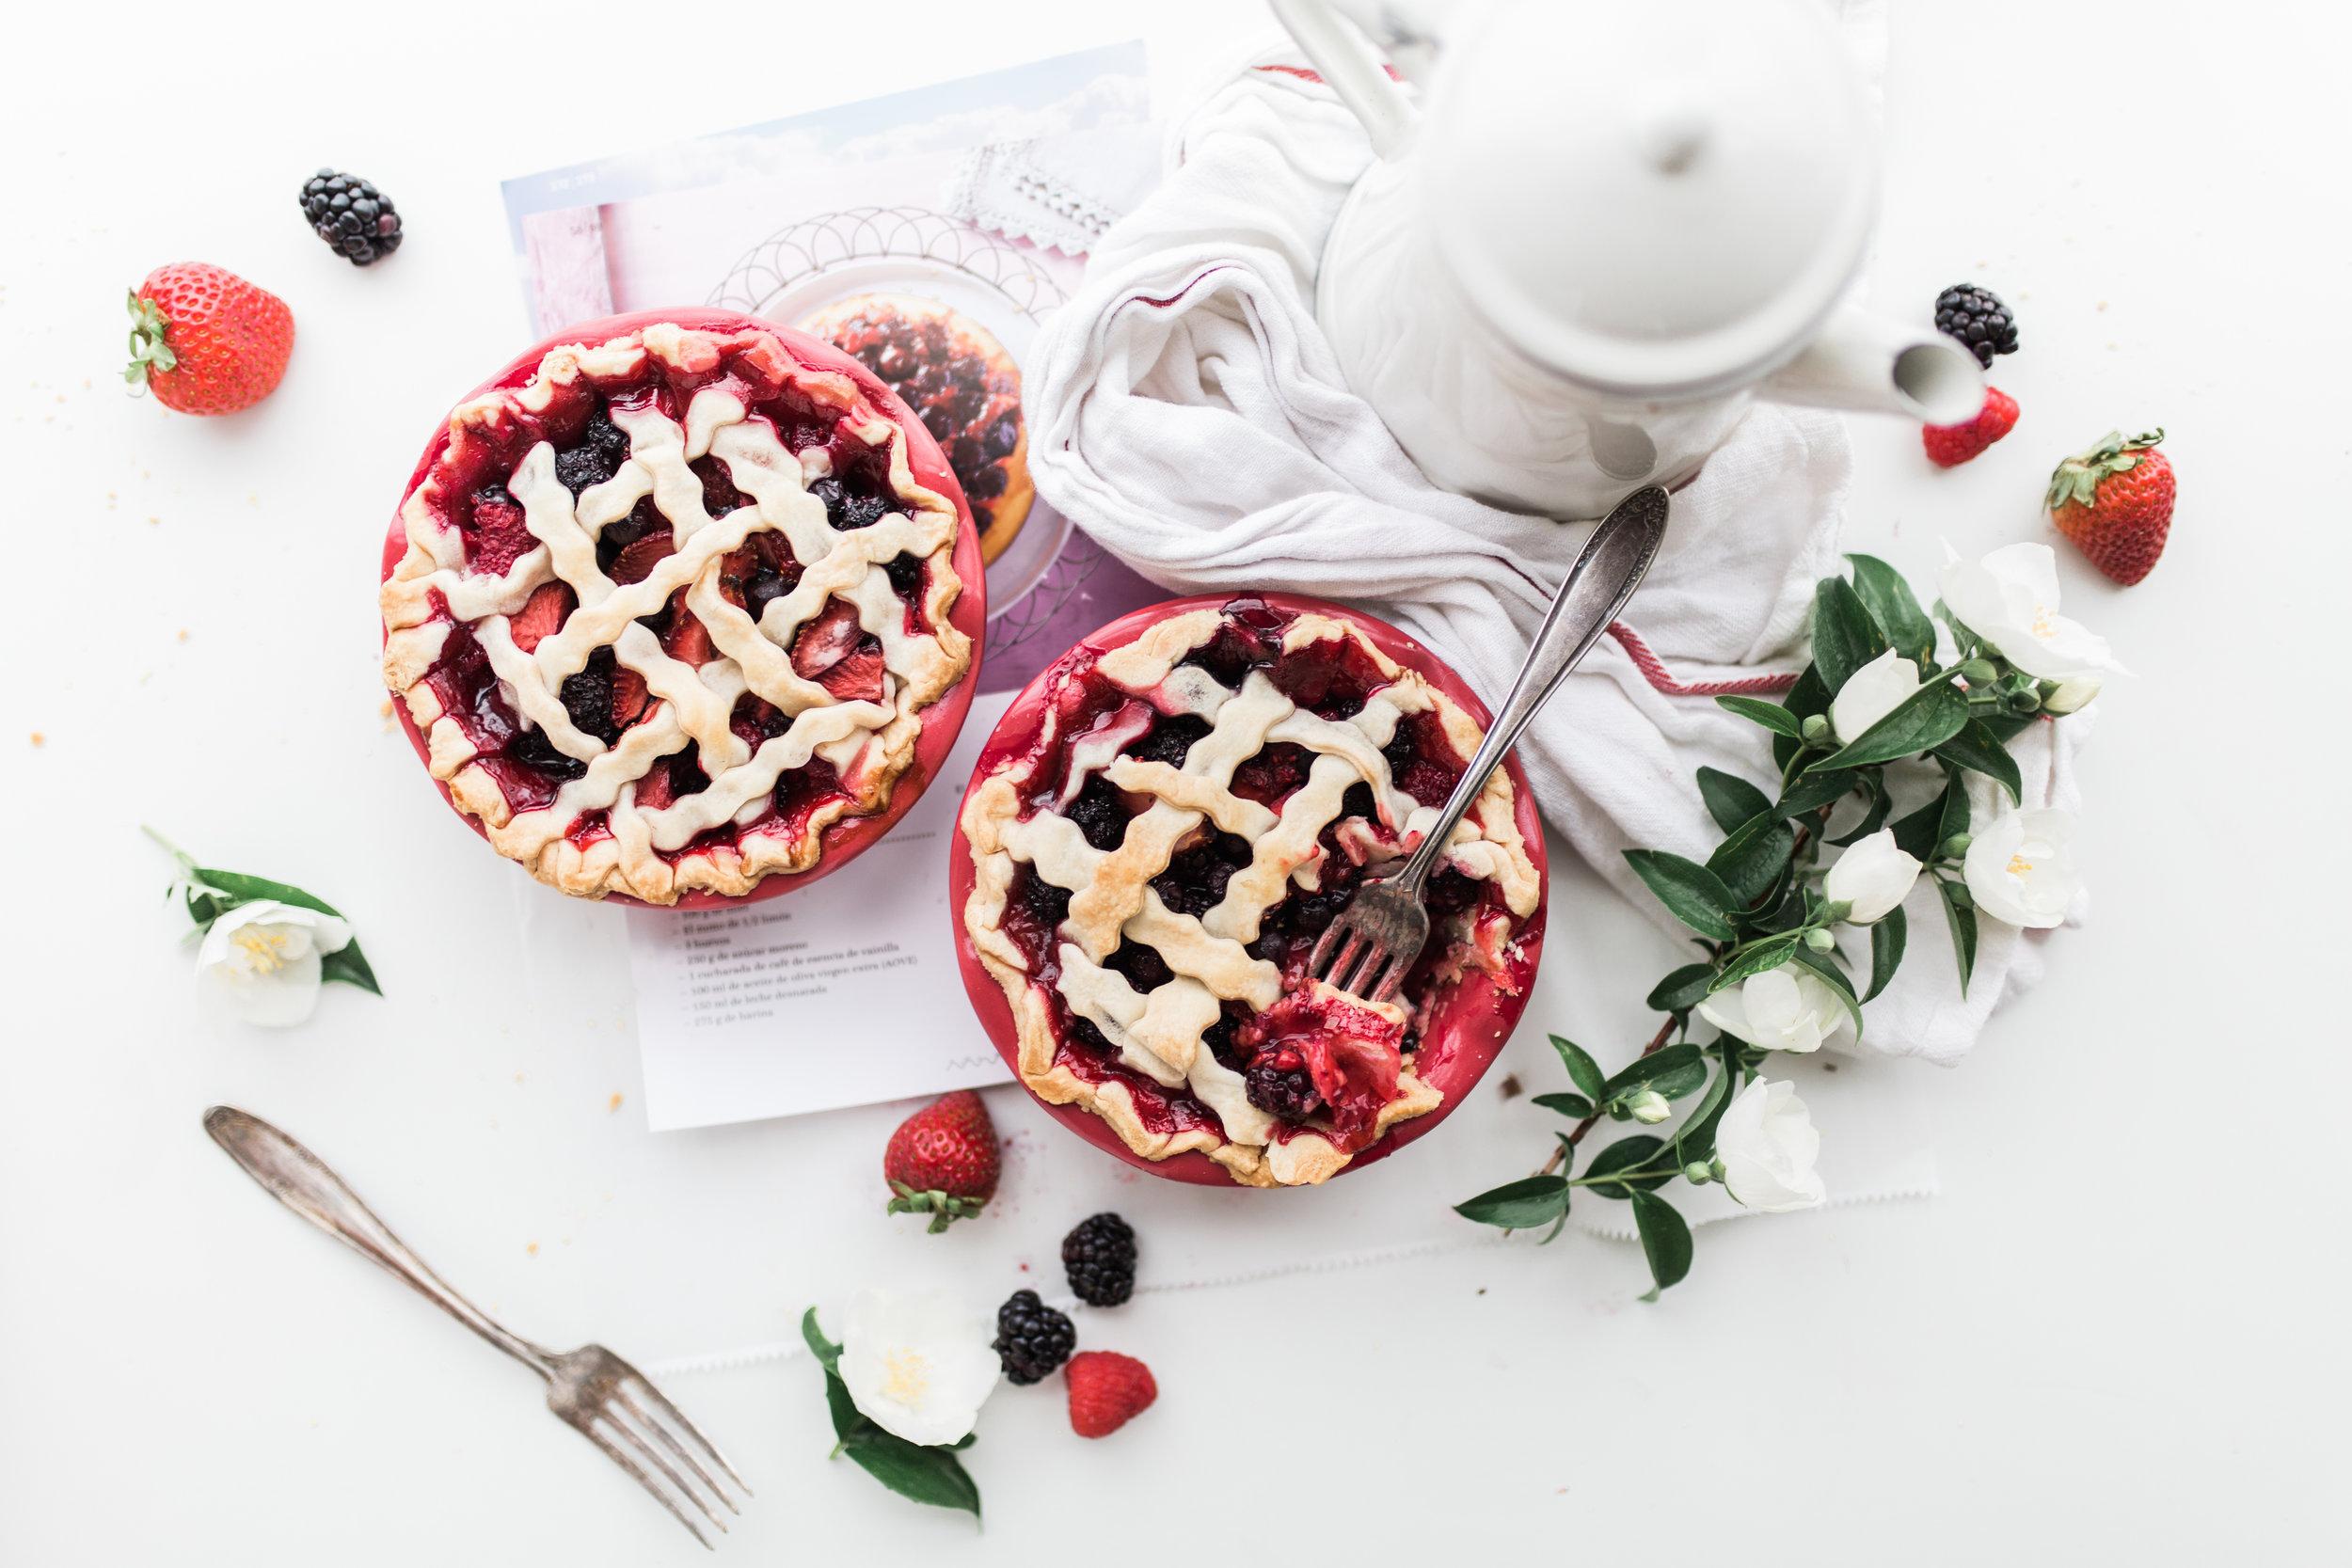 Don't Split the Pie - Make a dozen more